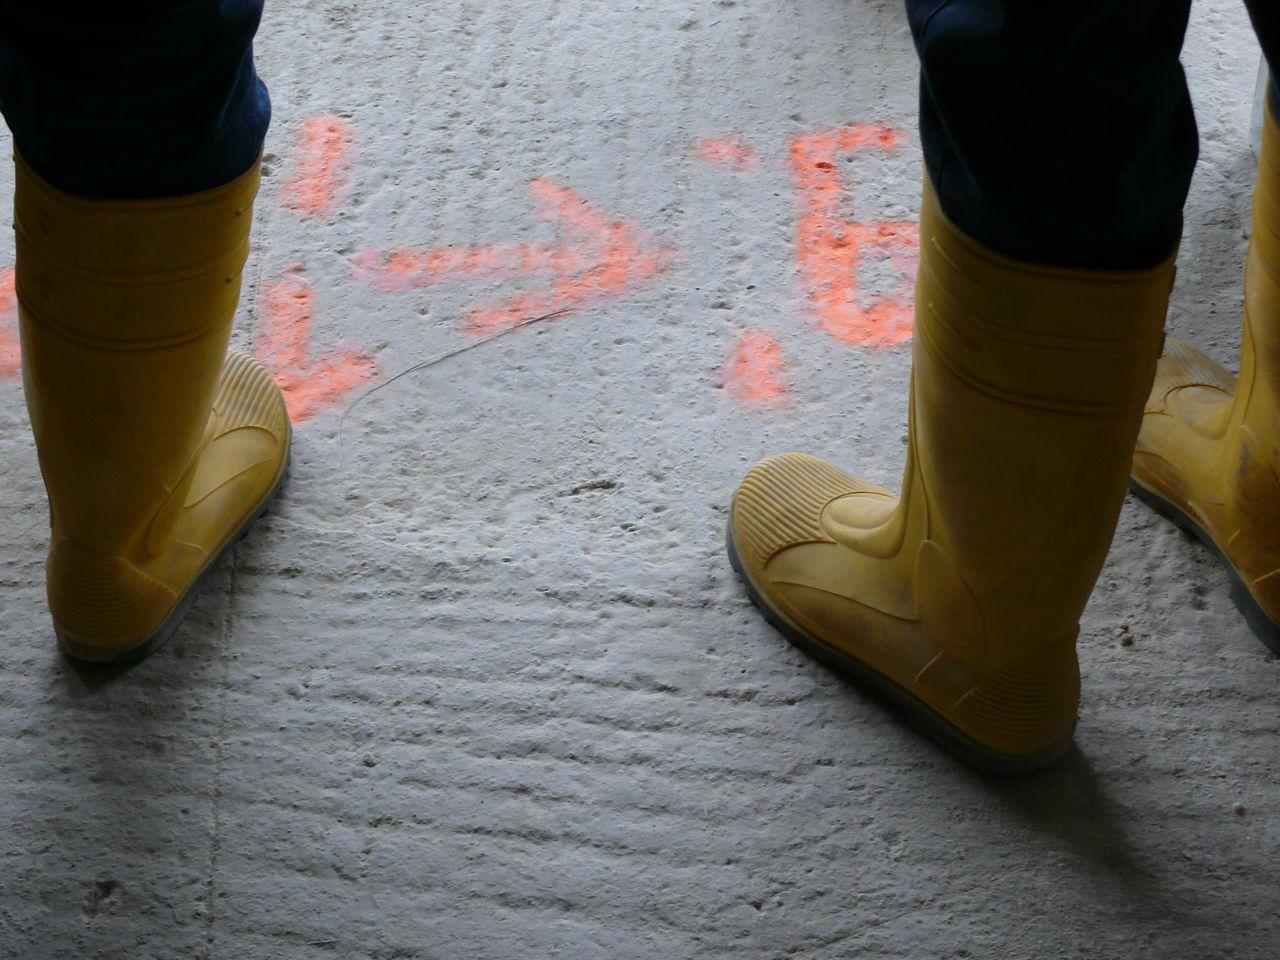 Concrete Construction Site Elbphilharmonie Hamburg Letters Marking Red Rubber Boots Yellow